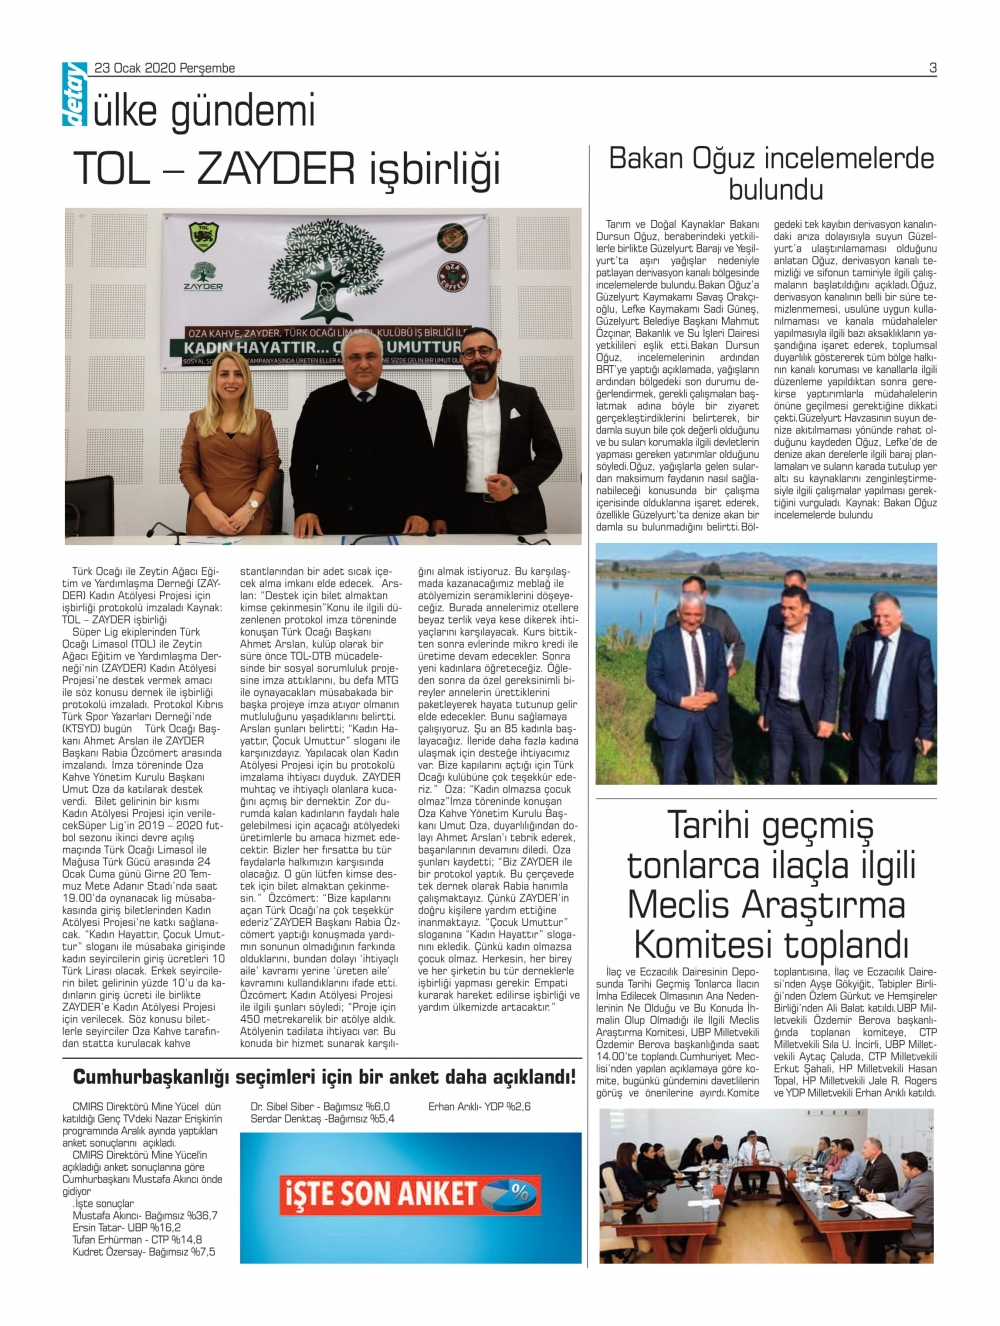 Detay Gazetes 24 Ocak 2020 galerisi resim 3